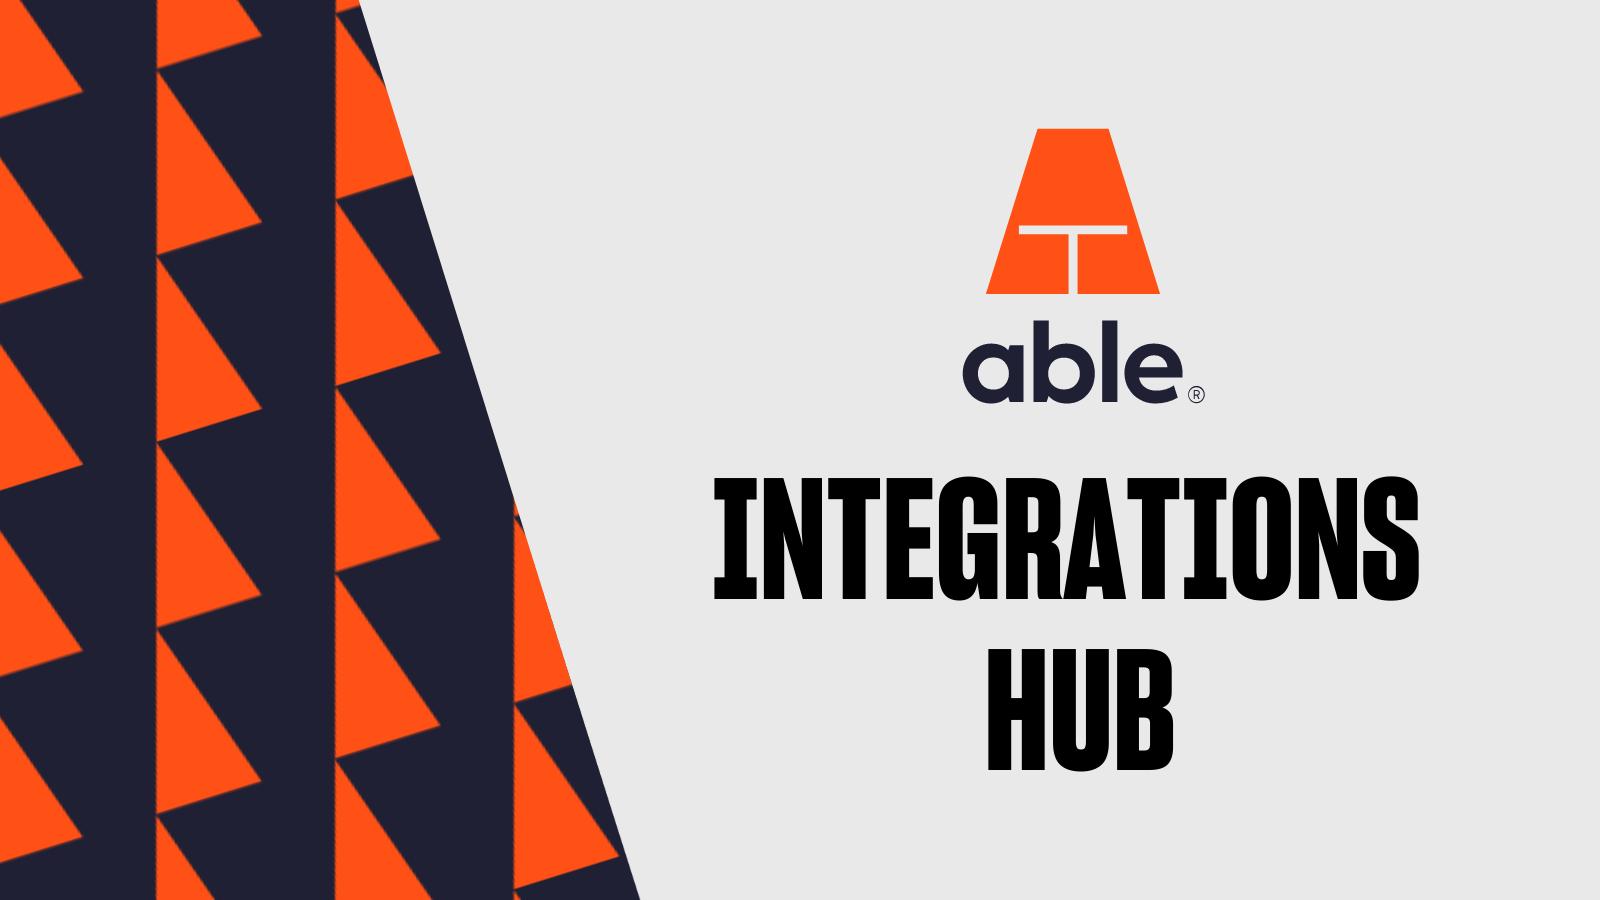 Able Integrations Hub